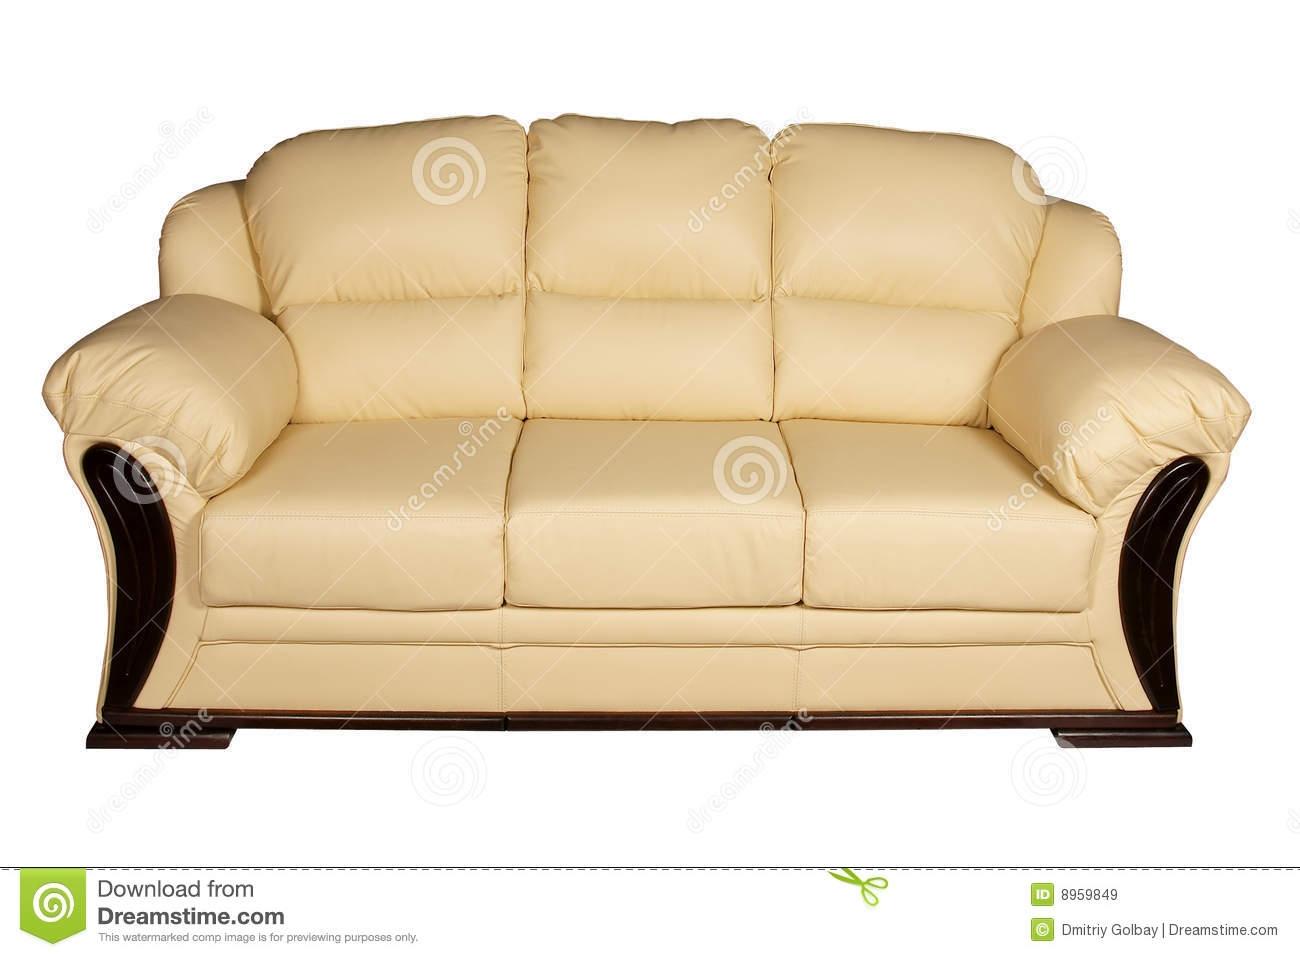 color sofa milan garden set cream colored leather couches